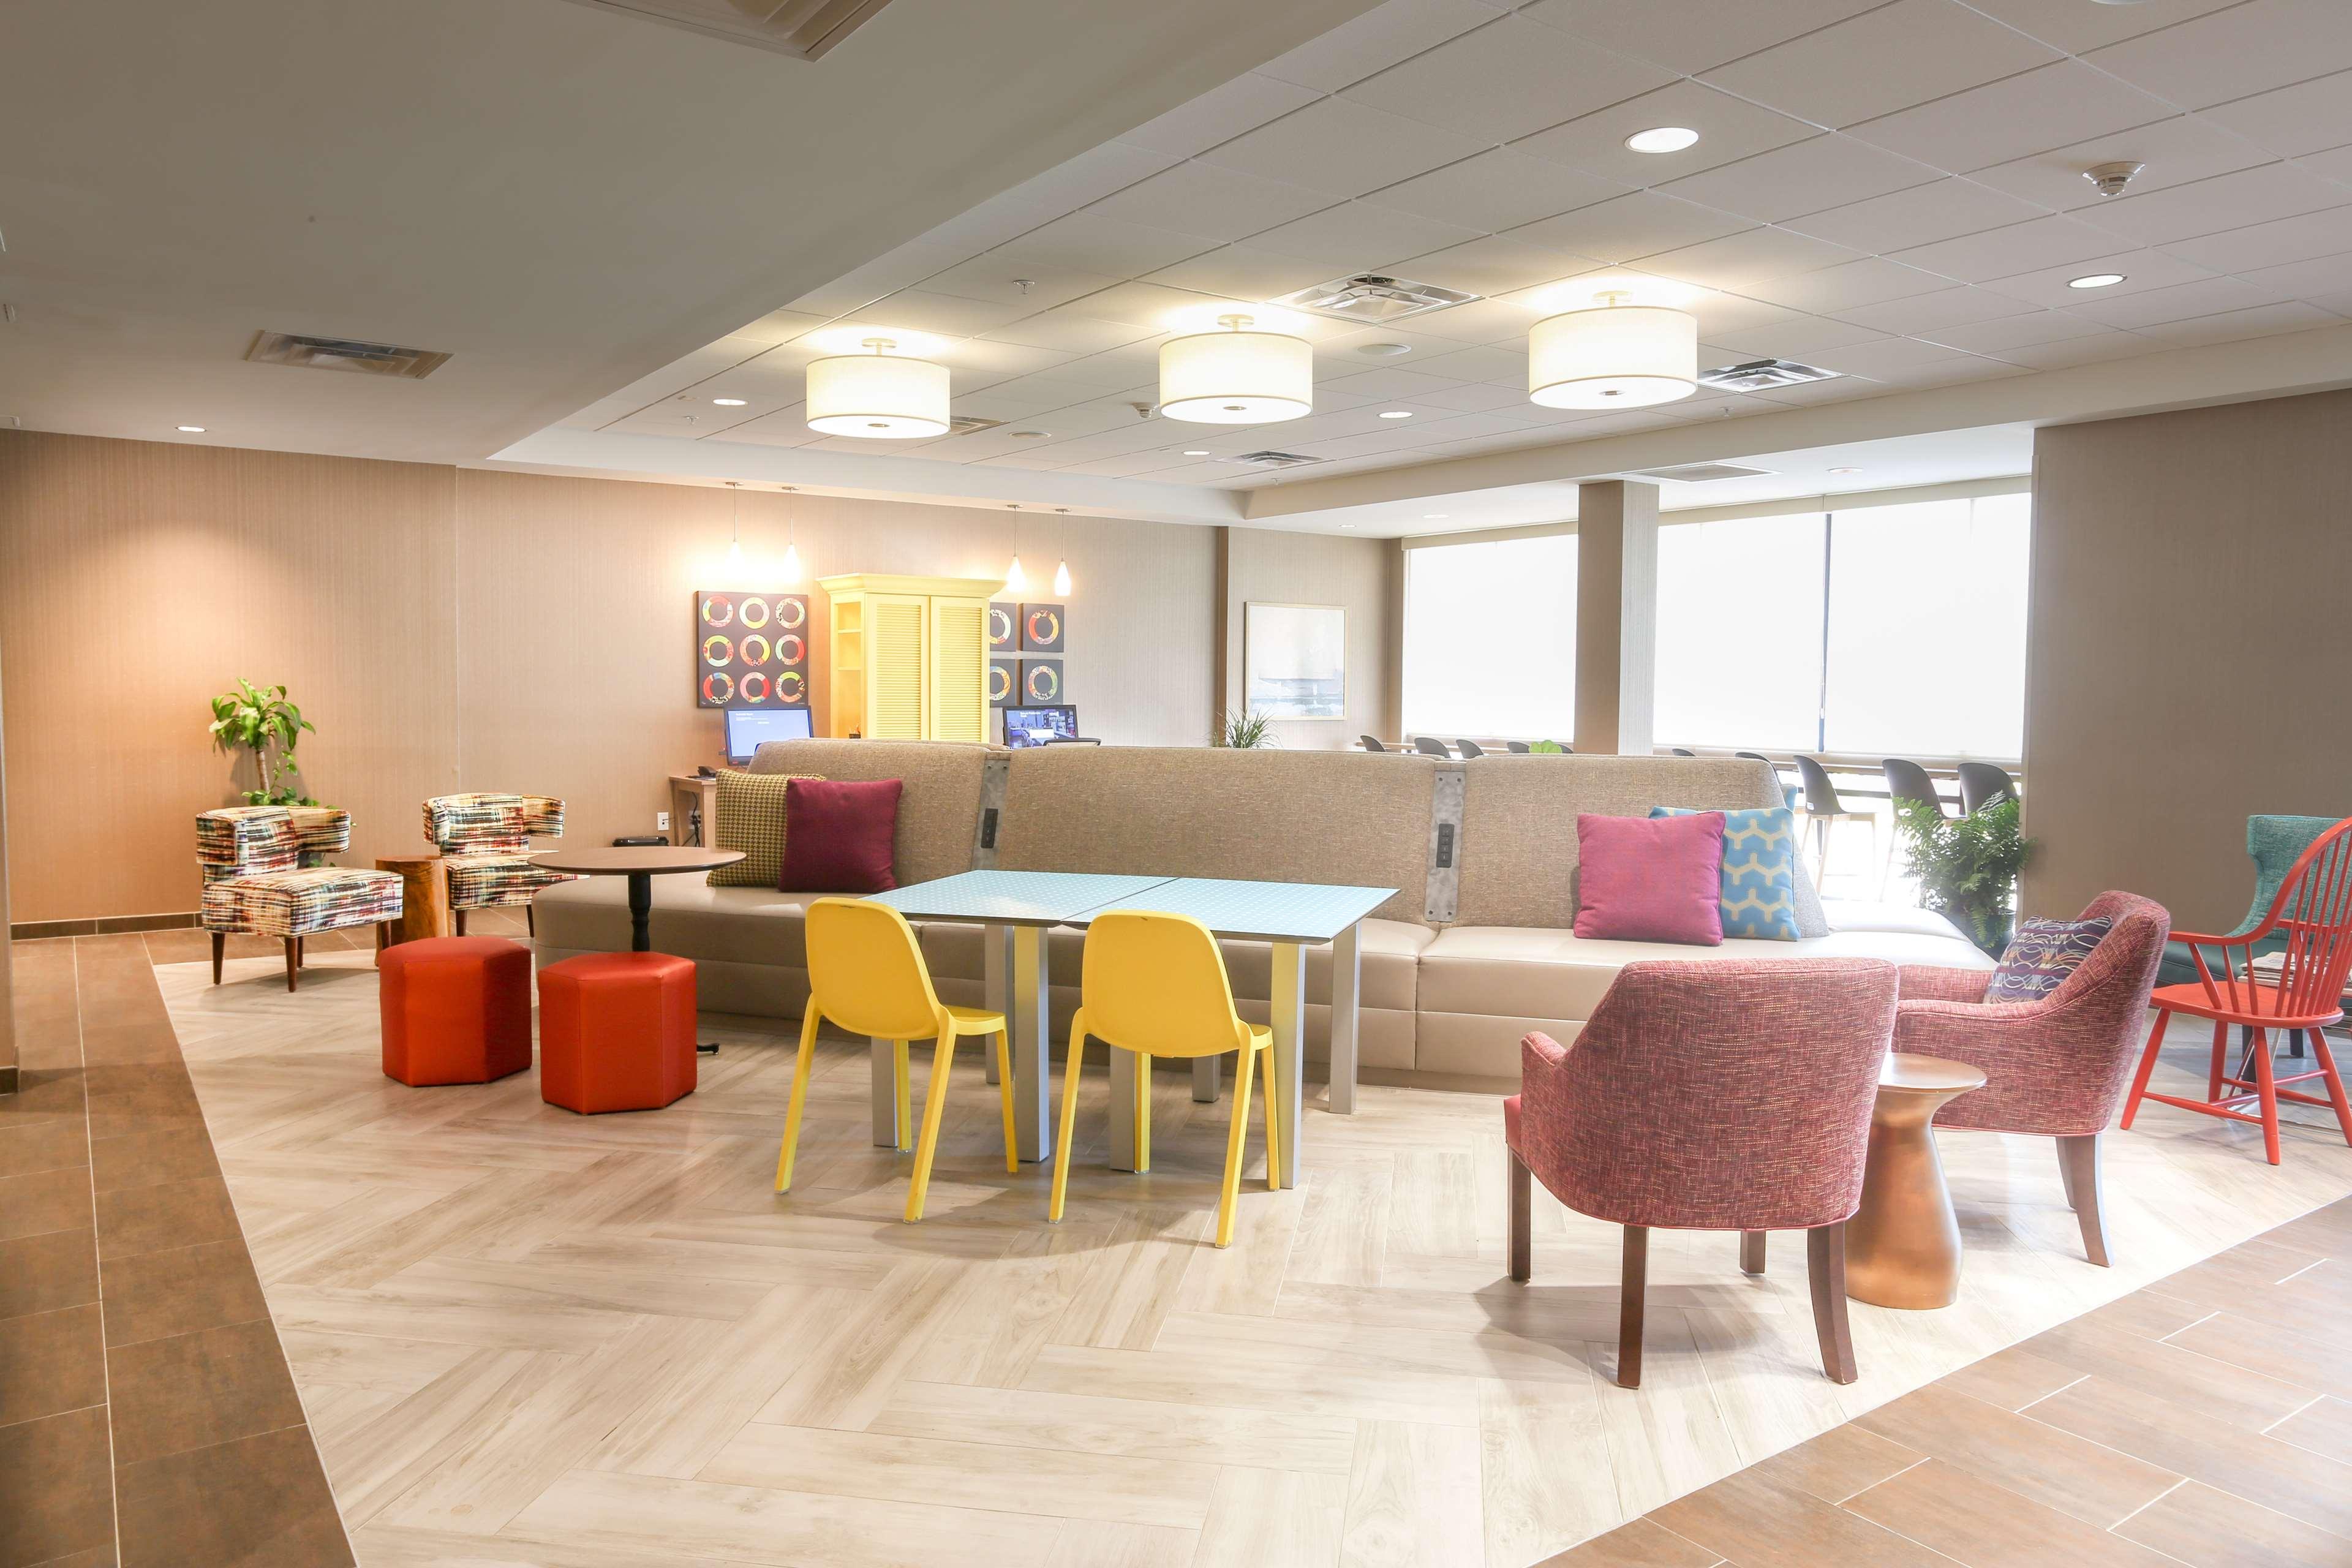 Home2 Suites by Hilton Bordentown image 8